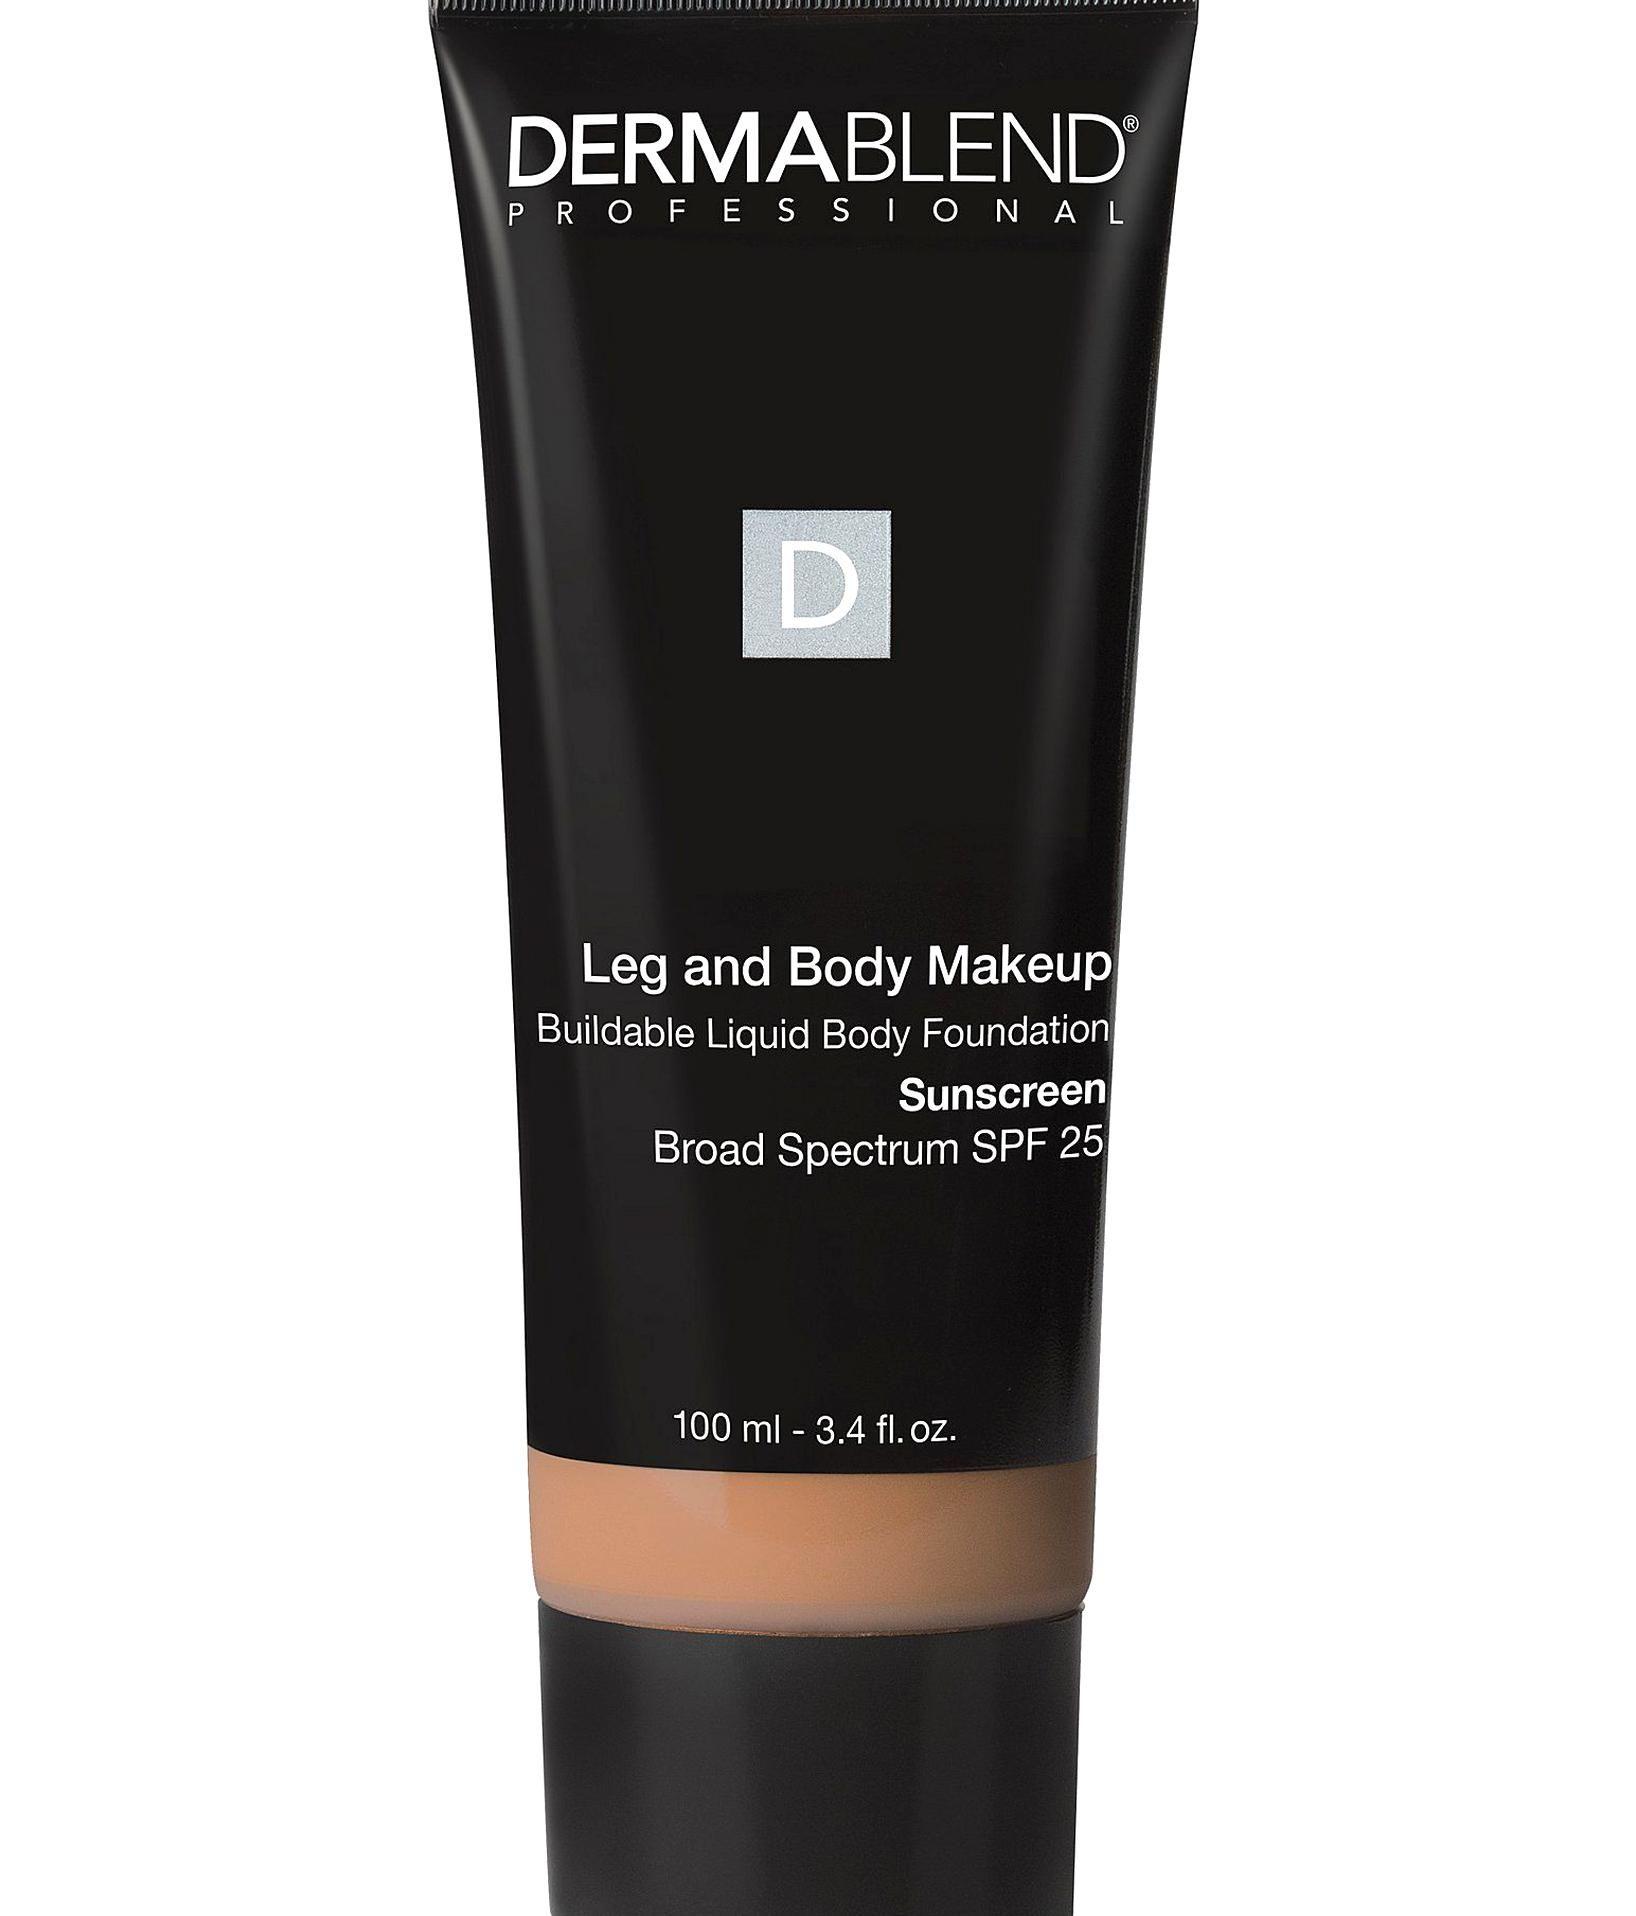 1 Dermatologist Rmended Coverage Brand Dermablend brings